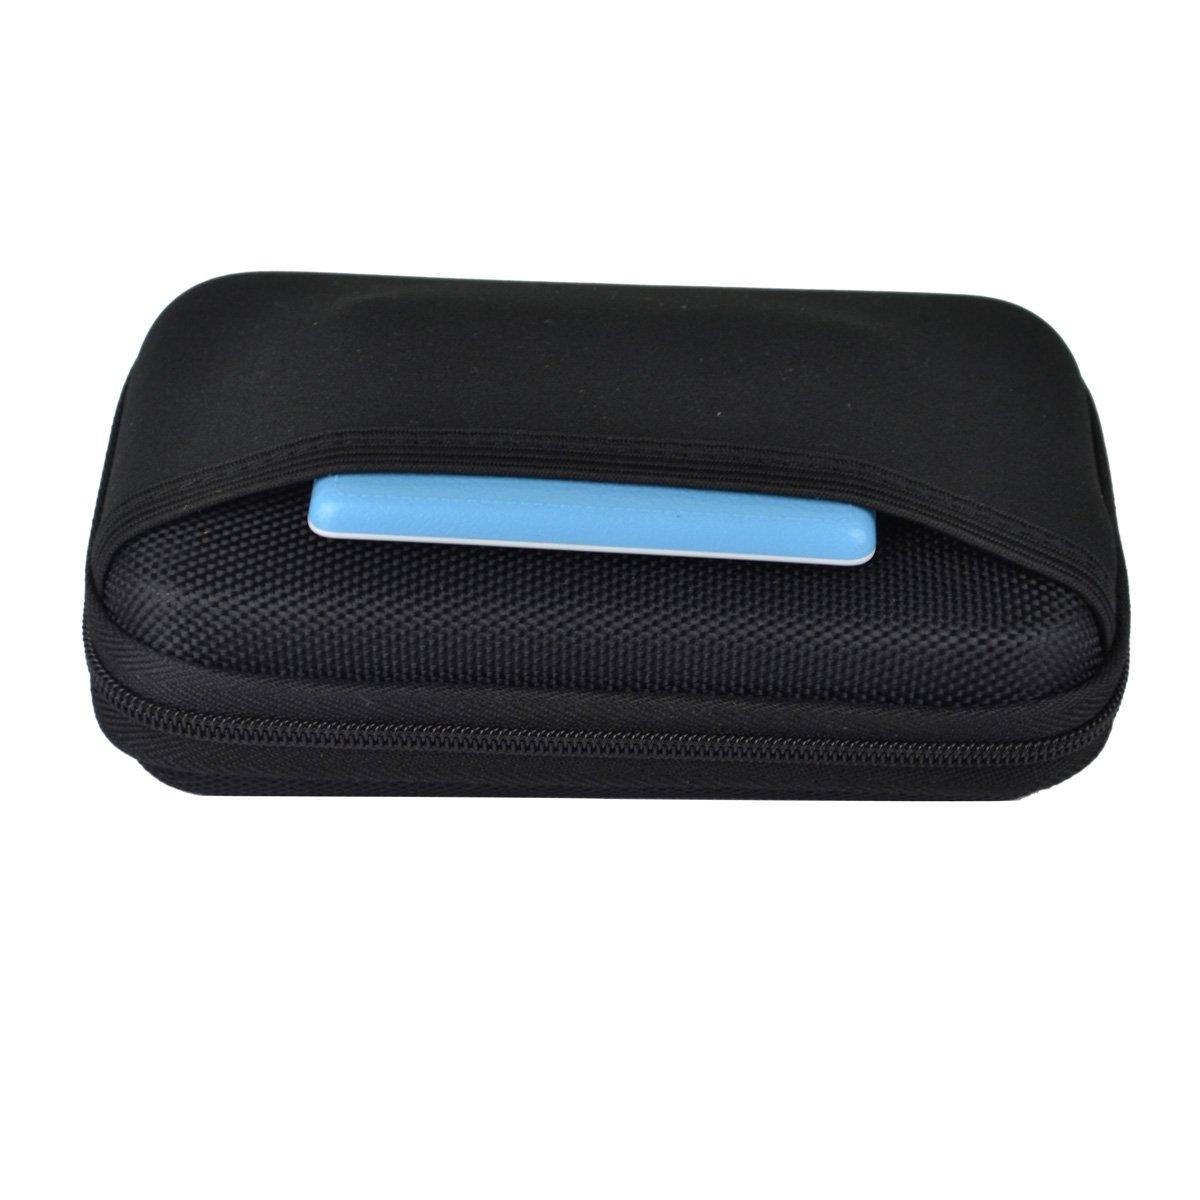 USB flash SD Card Negro Estarer Robusto Funda Bolso para disco duro externo